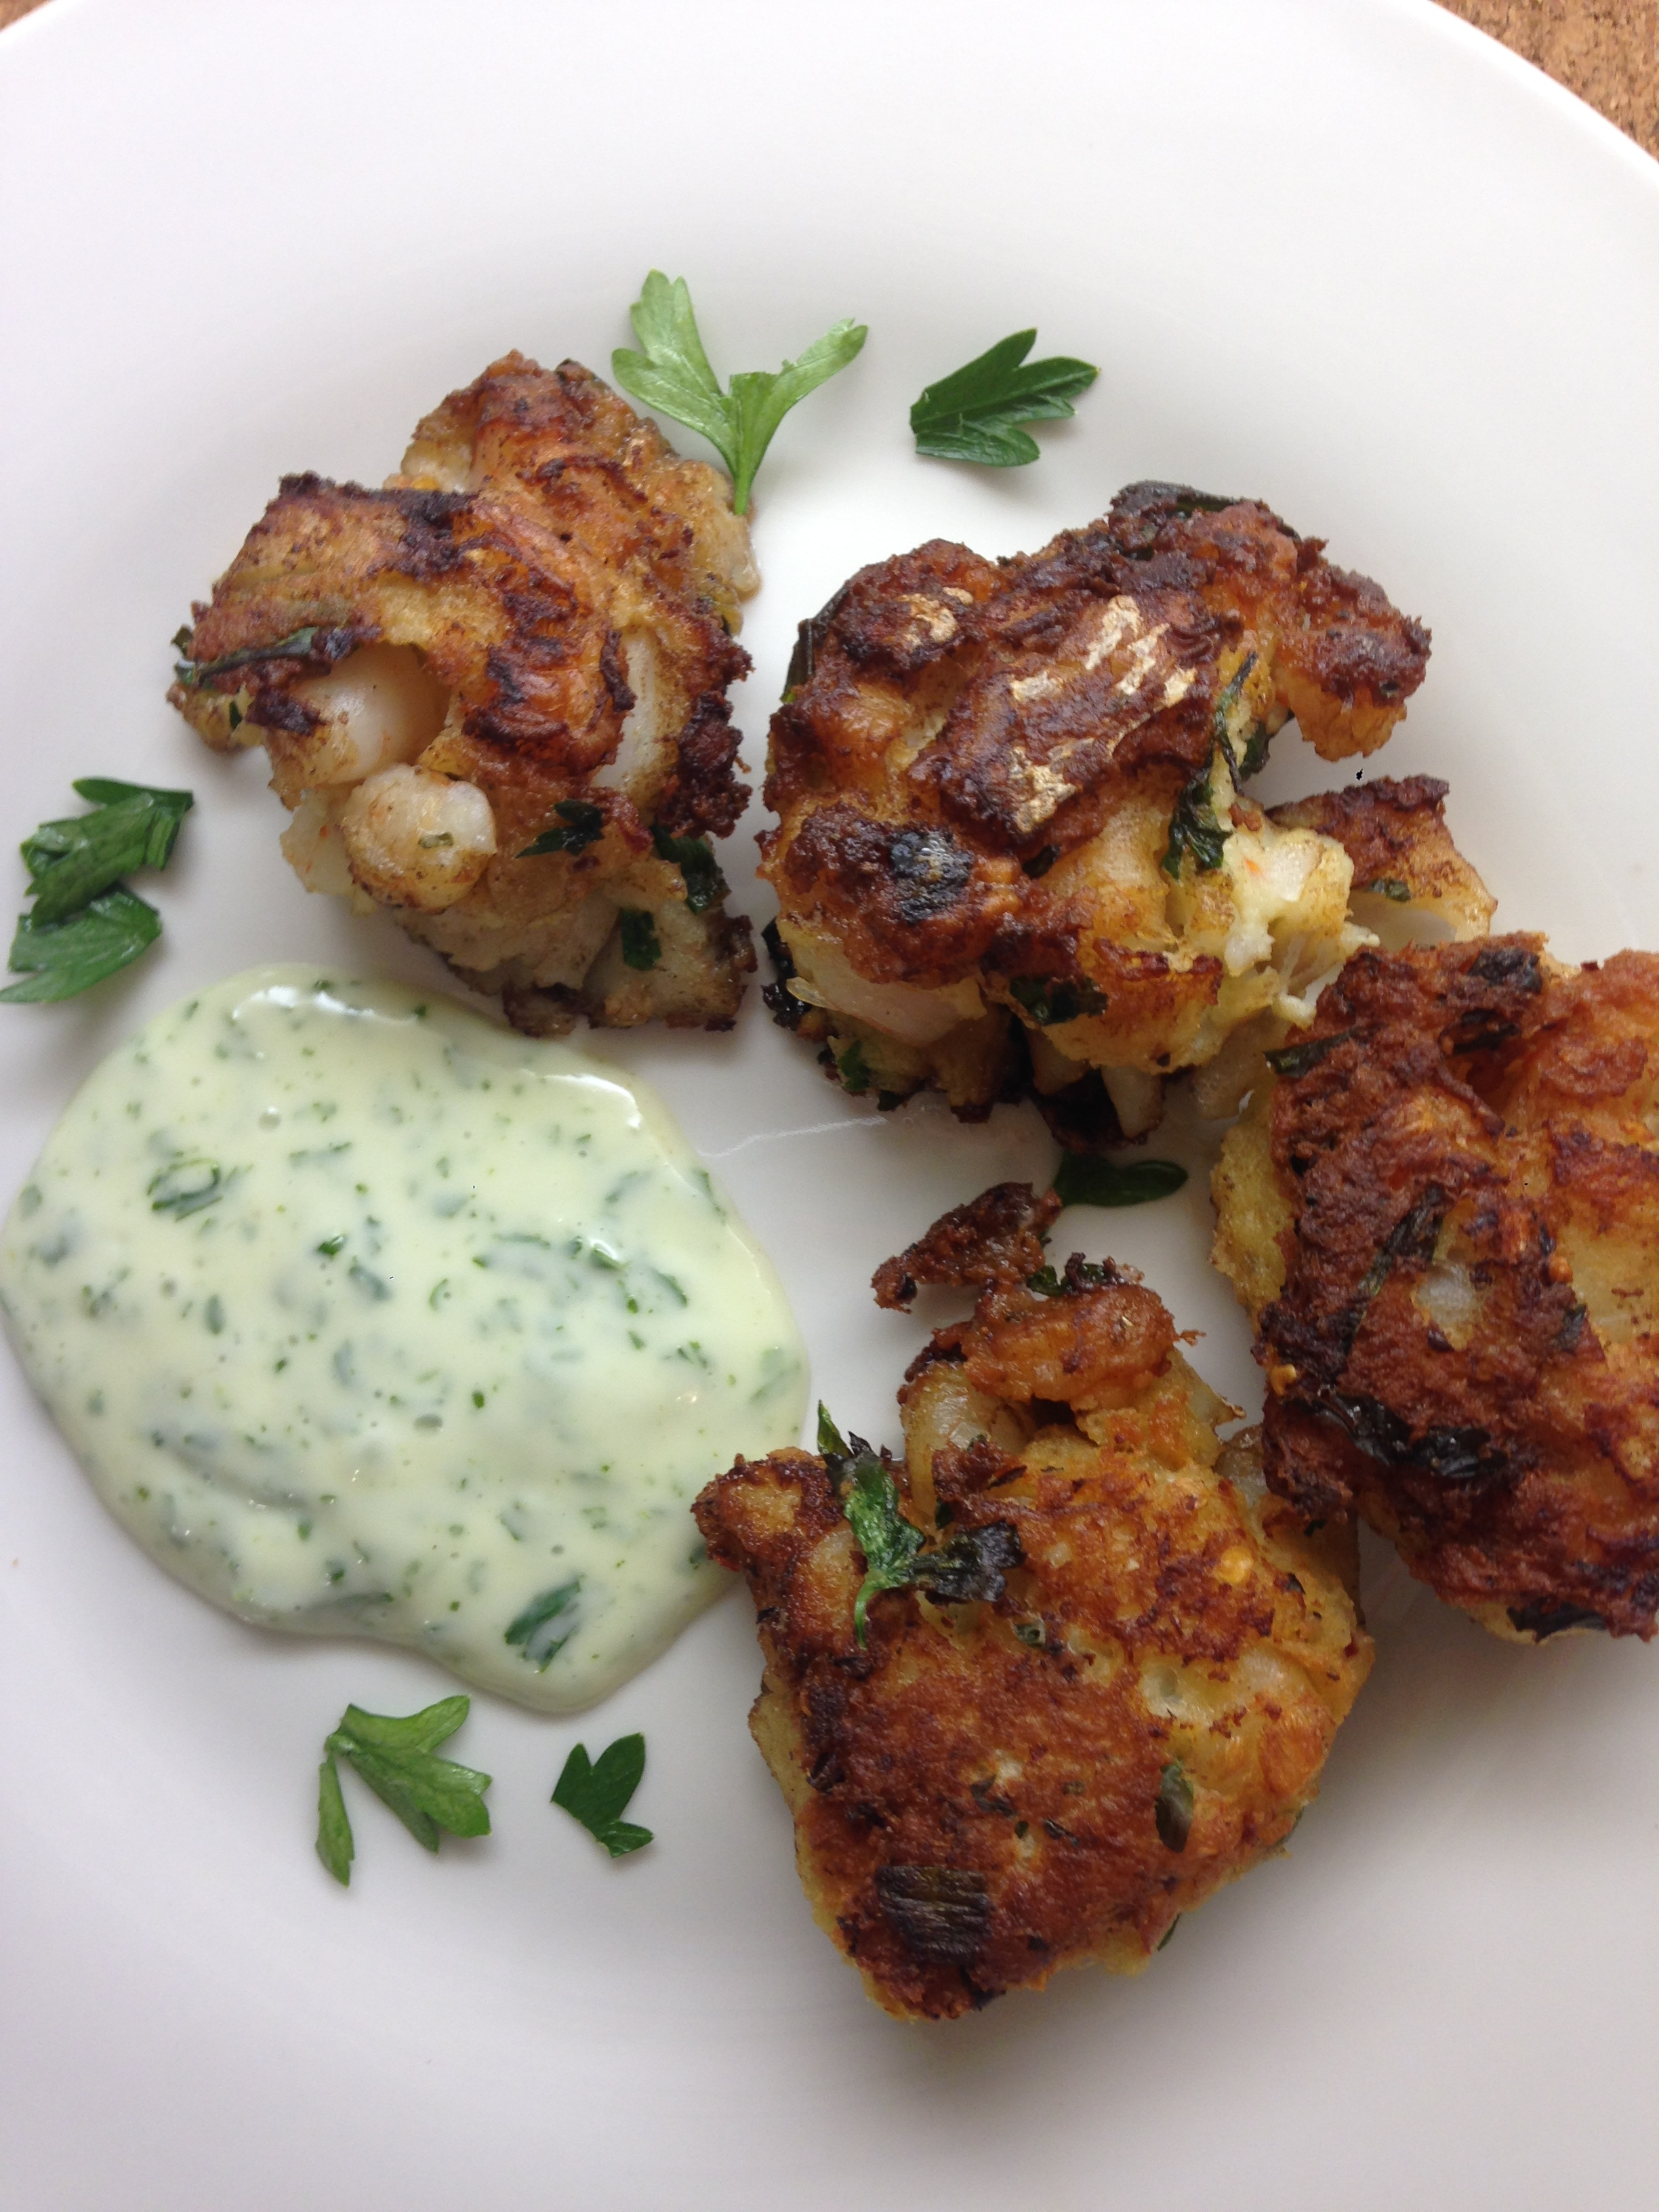 Andrea Fenise Memphis Fashion Blogger shares shrimp and cod cakes recipe